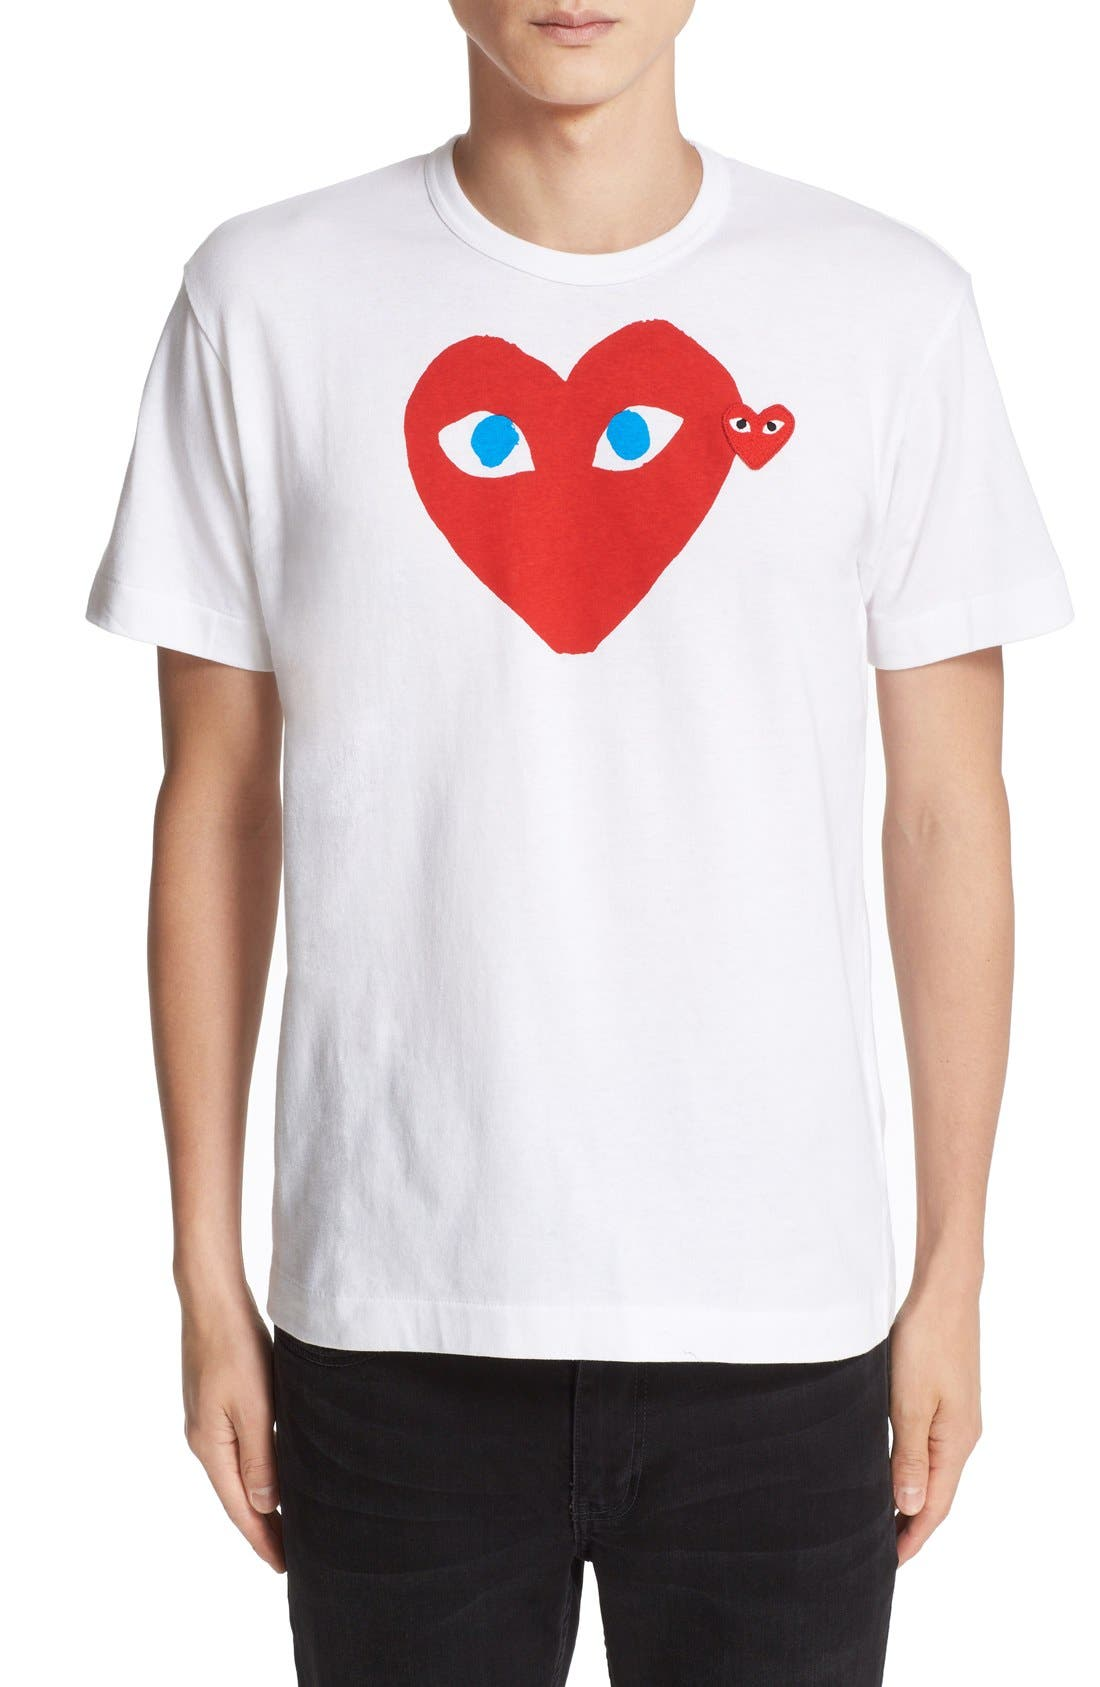 Comme des Garçons PLAY Heart Face Graphic T-Shirt